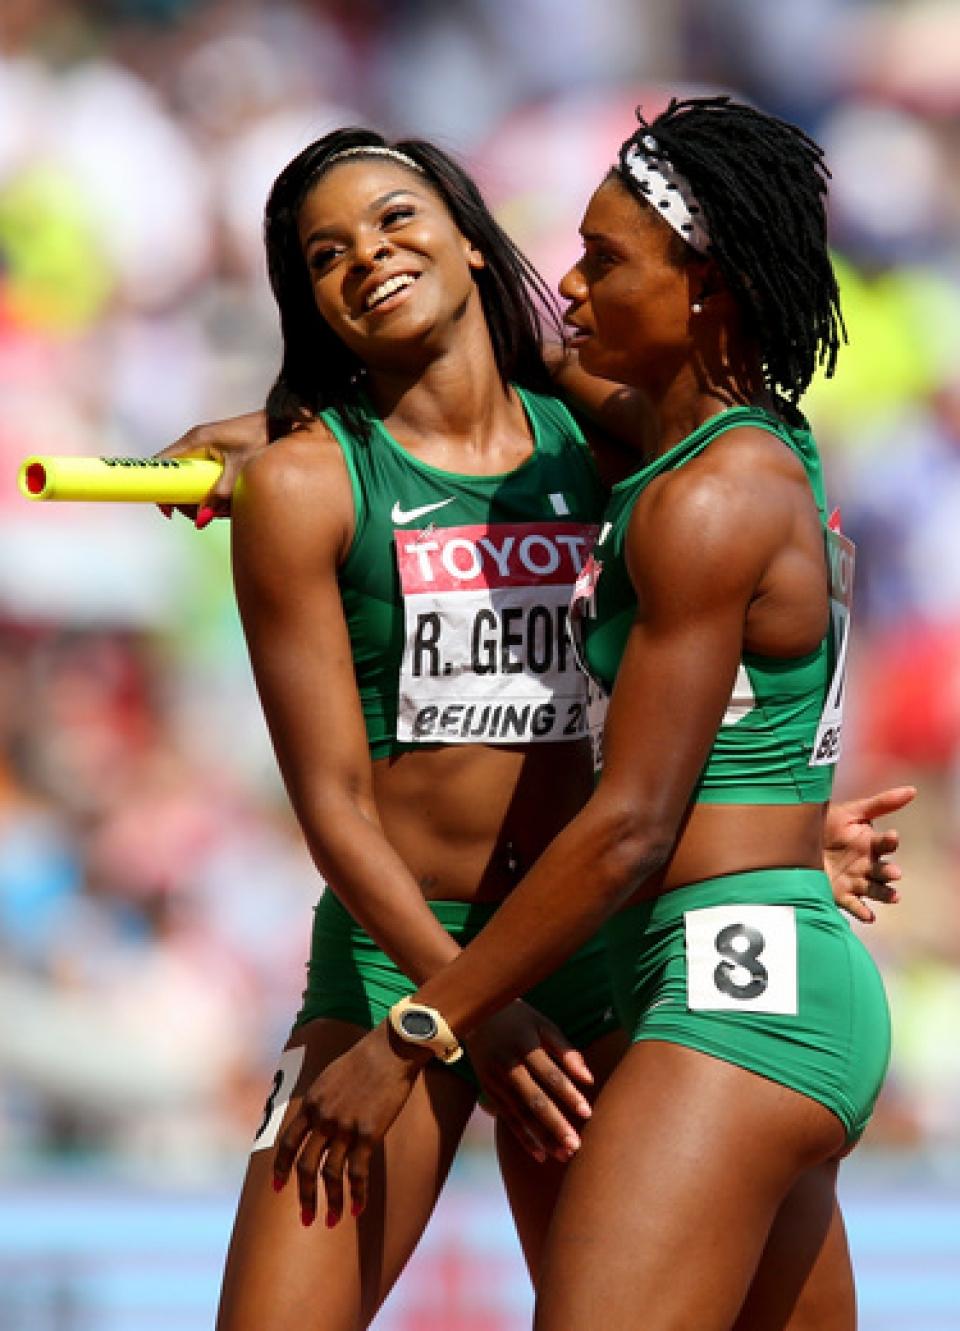 nigerialaisneitoset_voittivat_oman_4x400_metrin_alkueransa._-_getty.jpg